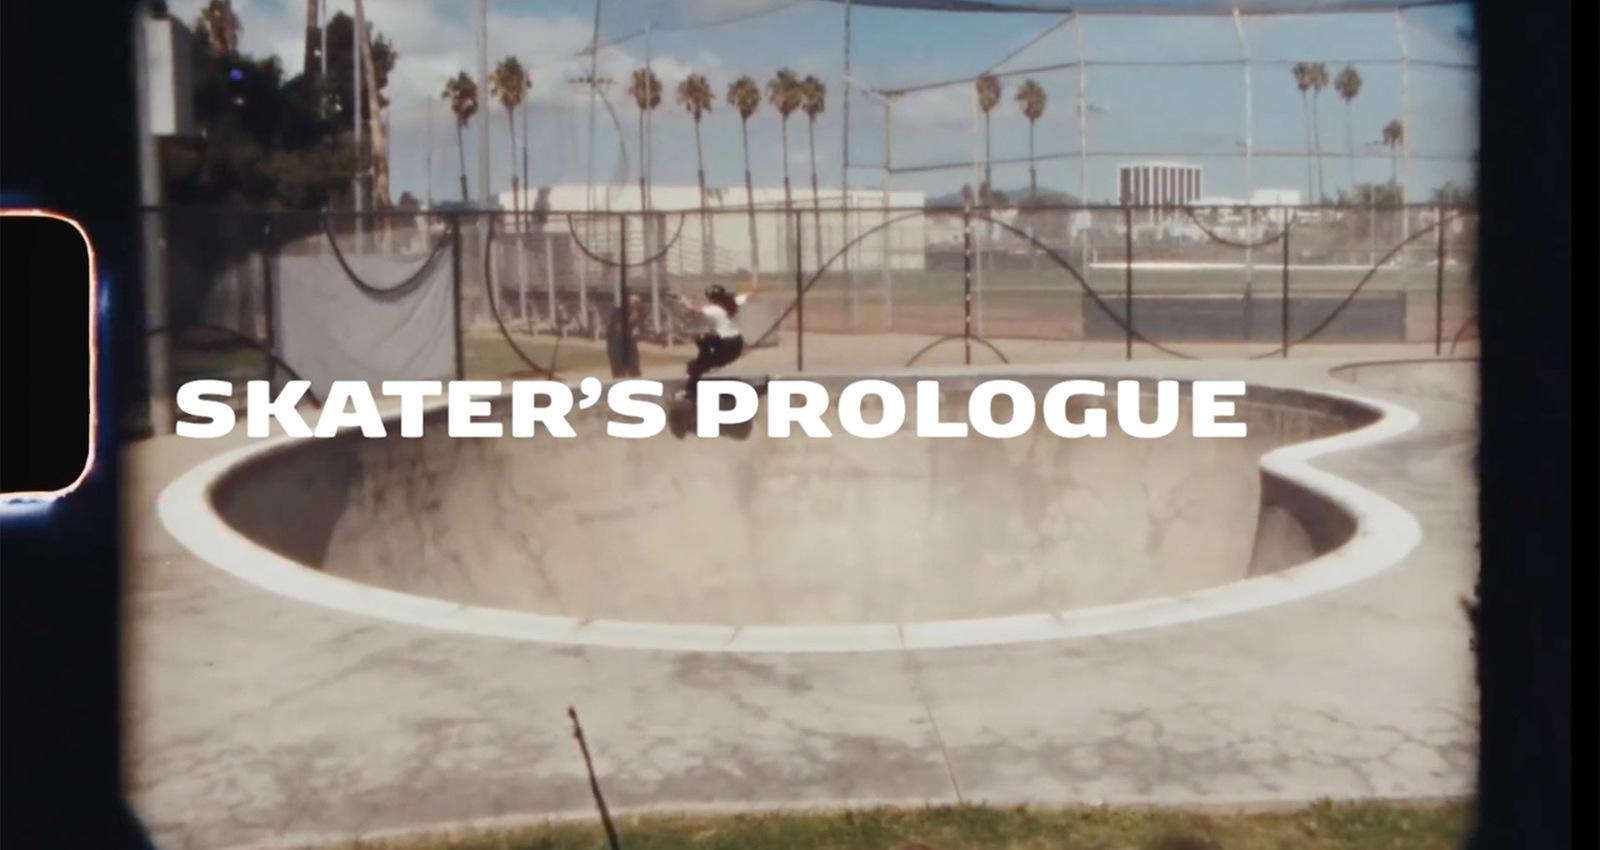 Skater's Prologue